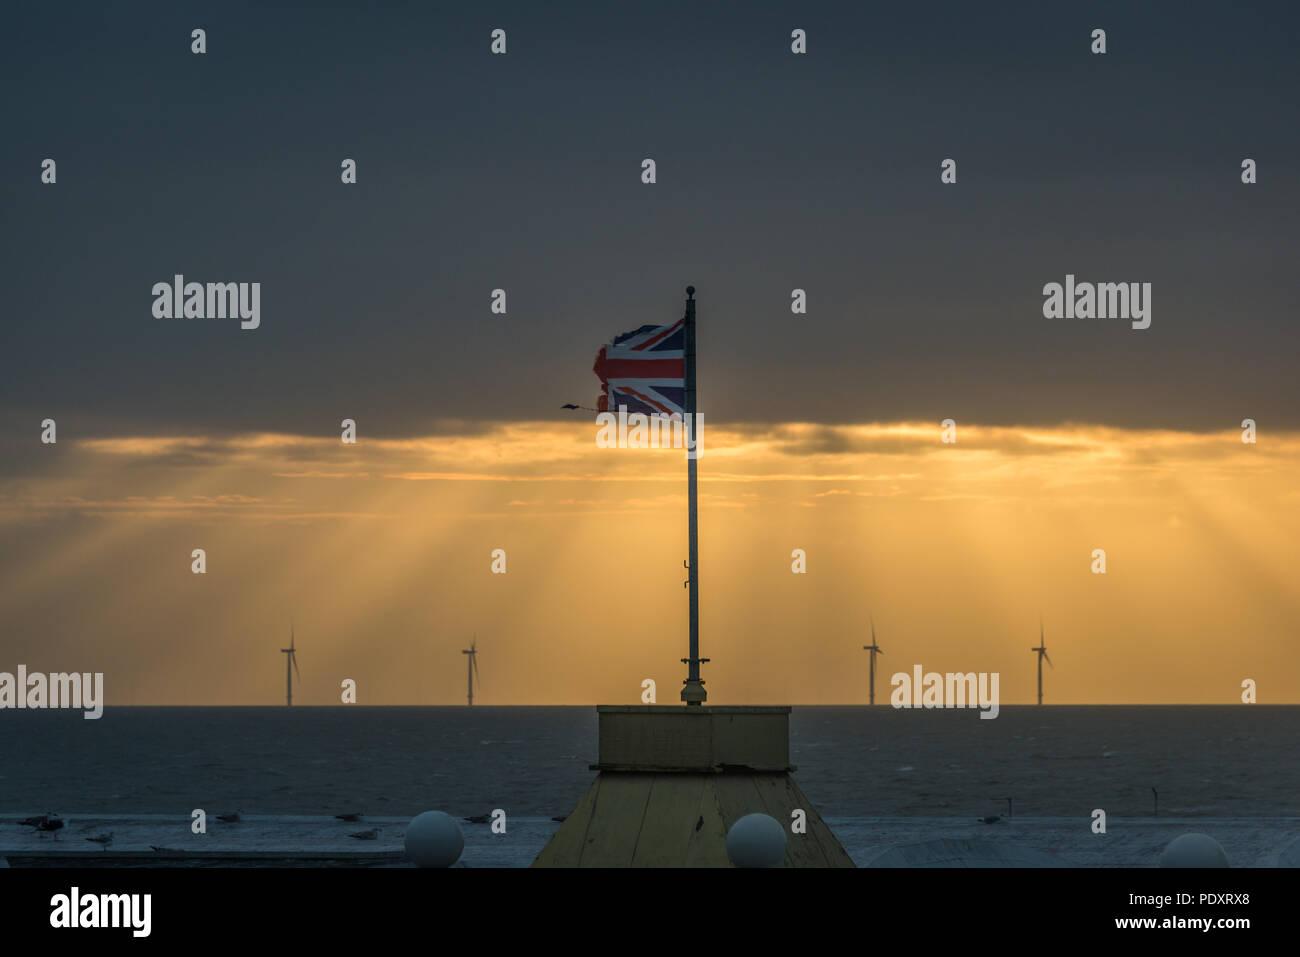 A weather-beaten Union Jack flag, Clacton-on-Sea, Essex, UK - Stock Image